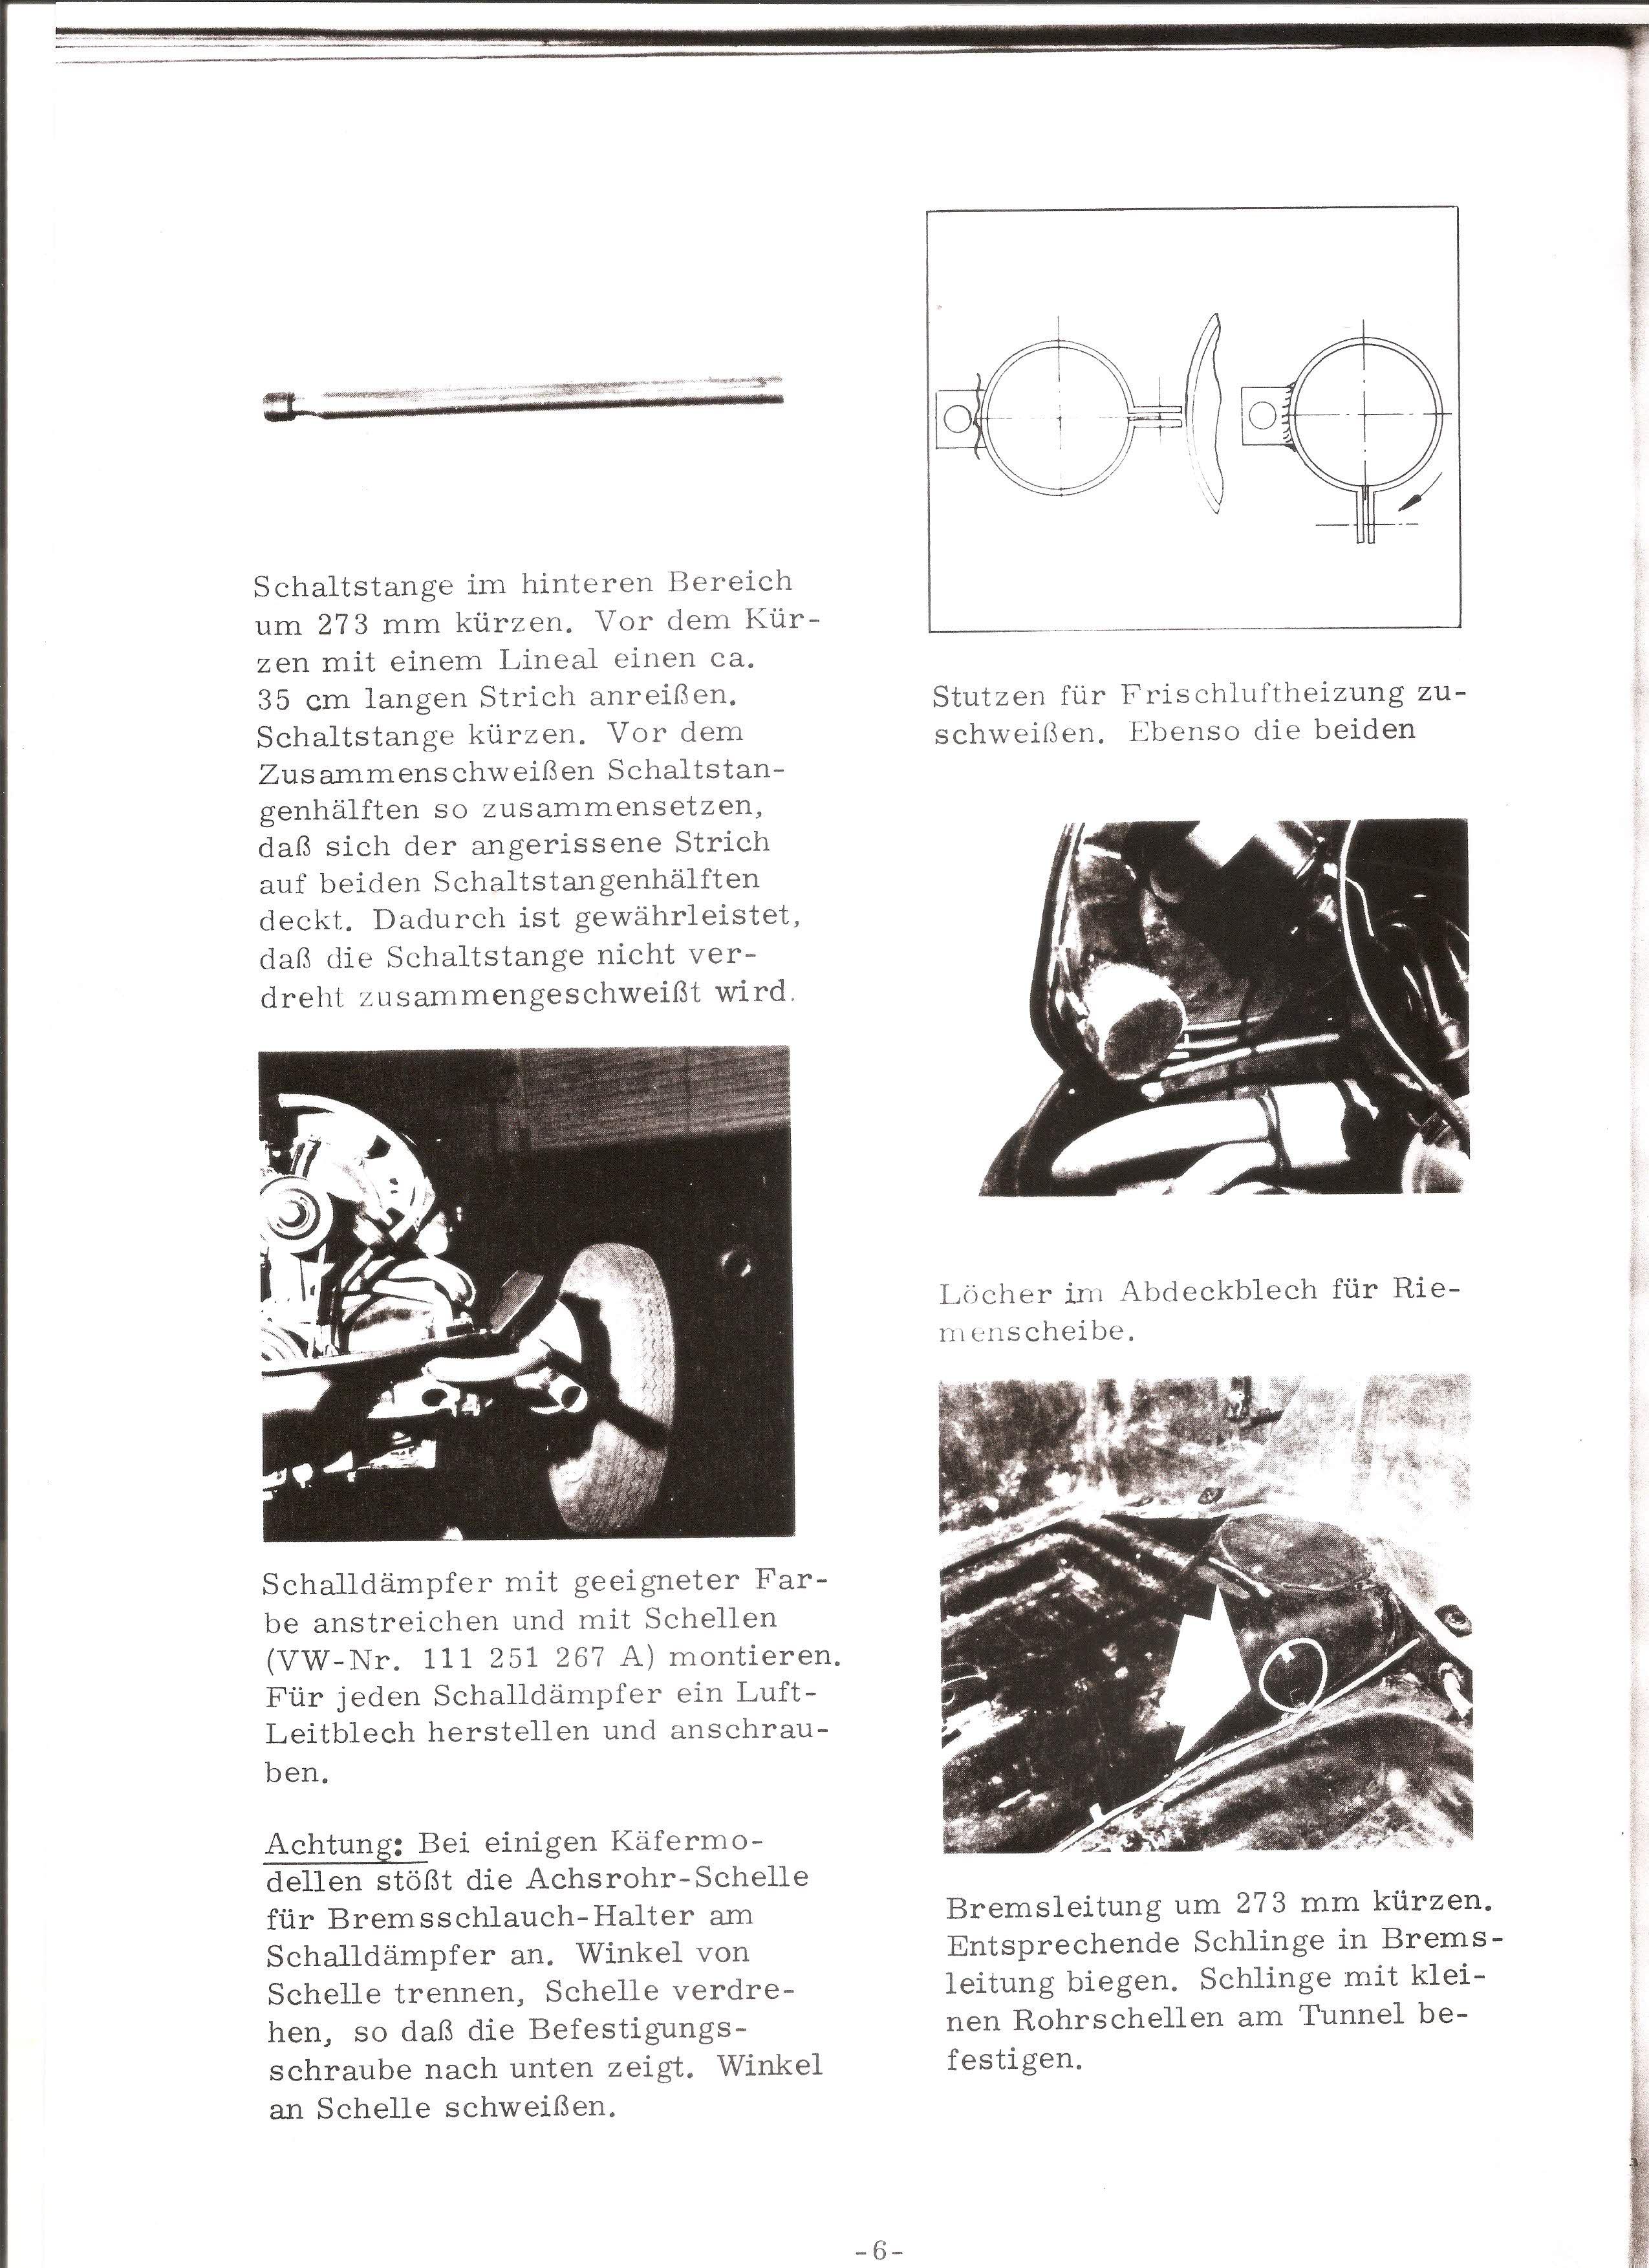 TheSamba.com :: VW Archives - Karmann Ghia GF Buggy Instructions ...